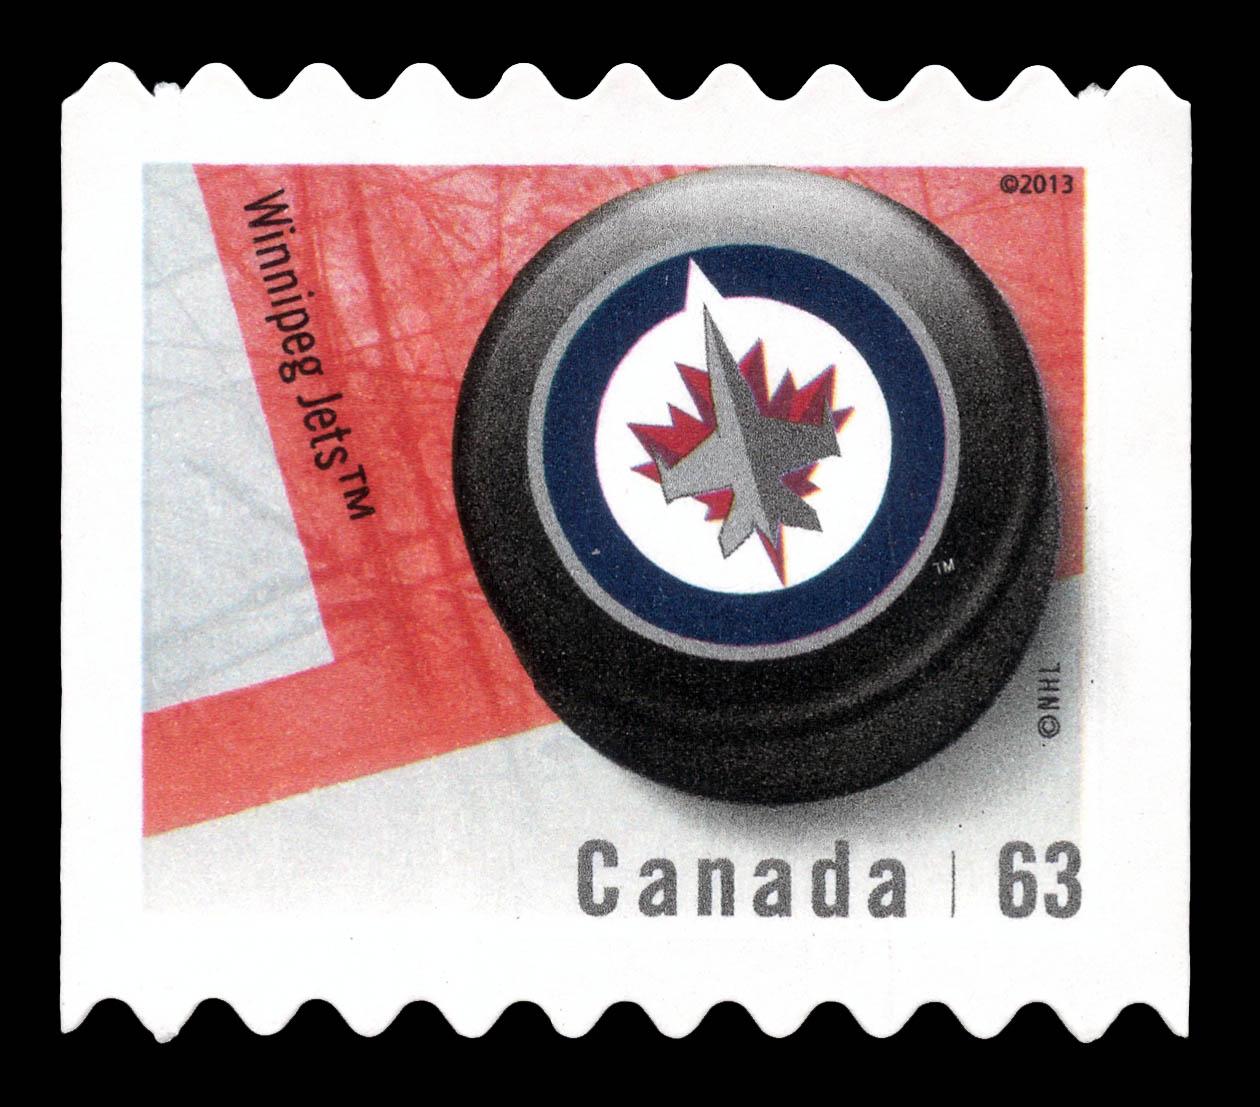 Winnipeg Jets Canada Postage Stamp | NHL Canadian Team Pucks